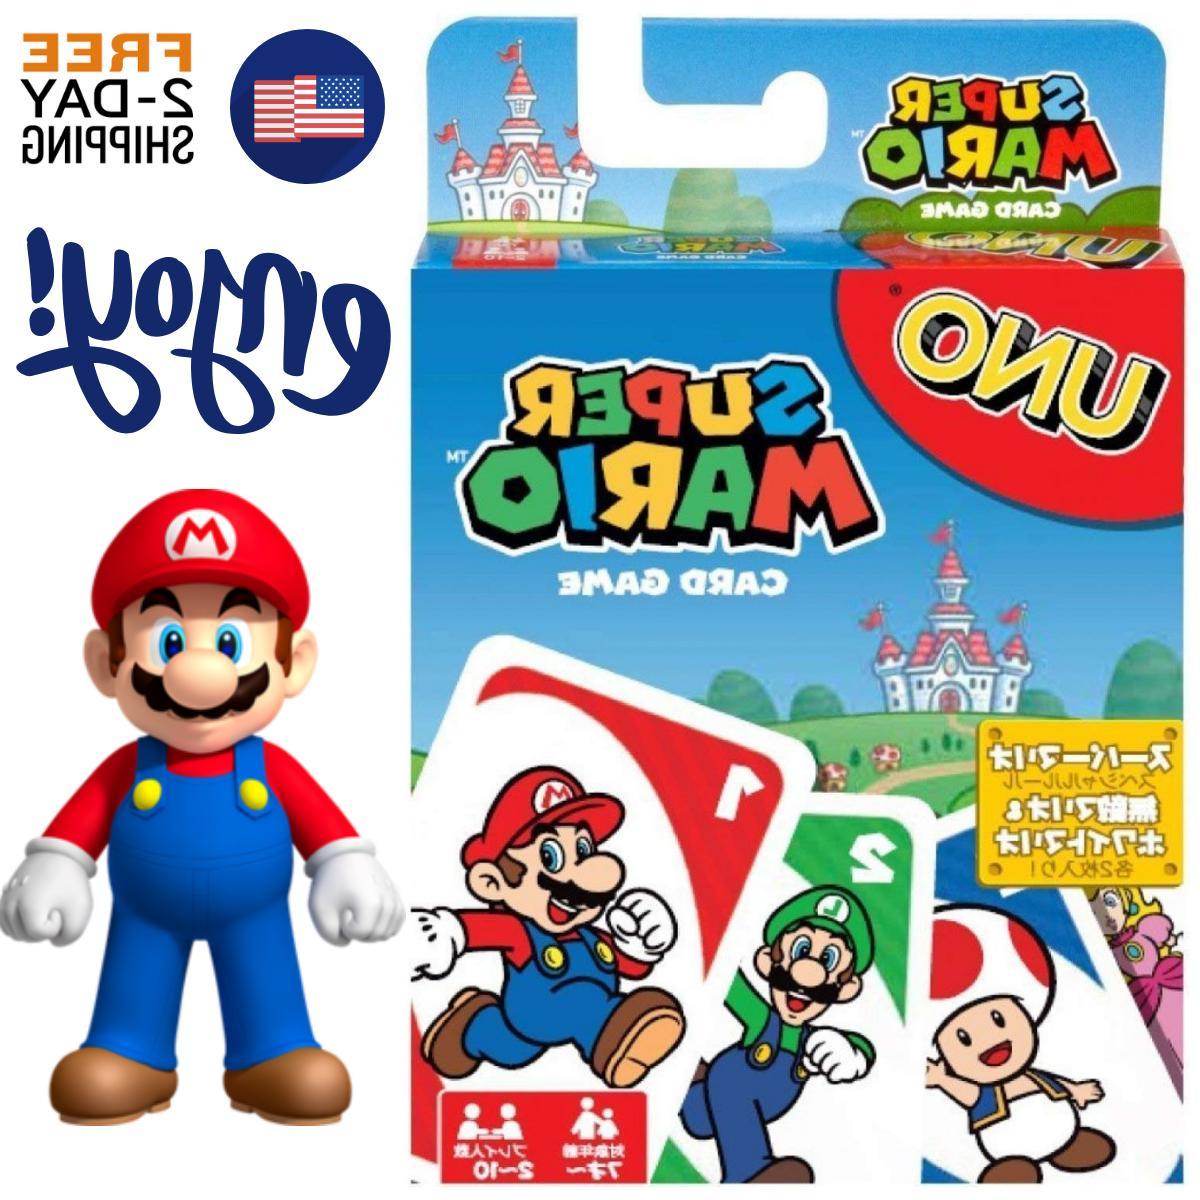 NEW UNO Classic Super Mario  Fun Card Game Incl. Special Mar